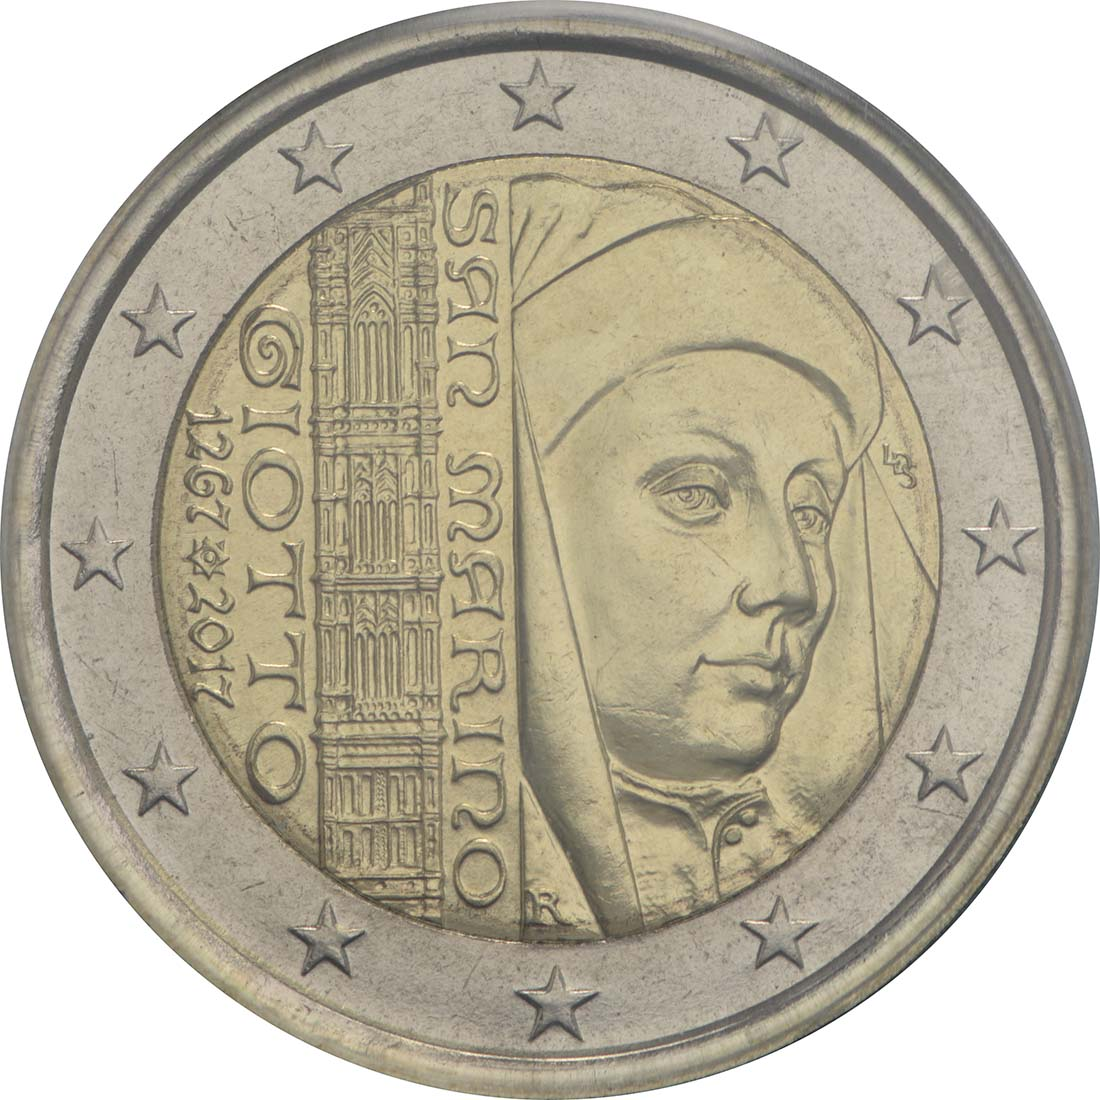 2017 271 San Marino Giotto.jpg